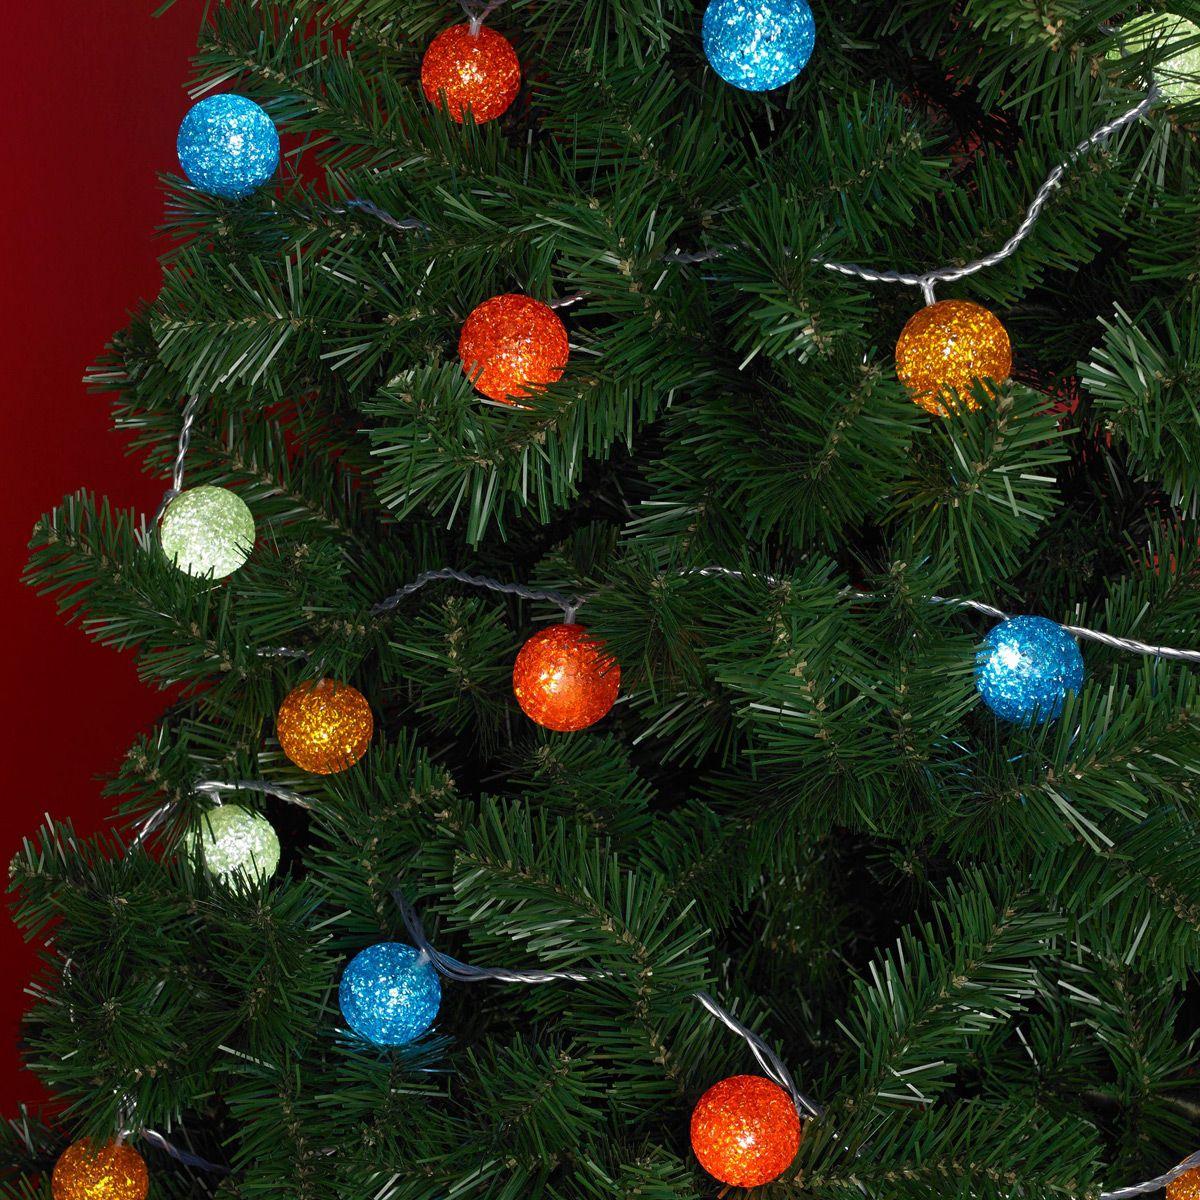 christmas lights source best christmas lights fairy lights 2014 source christmas tree lights bq